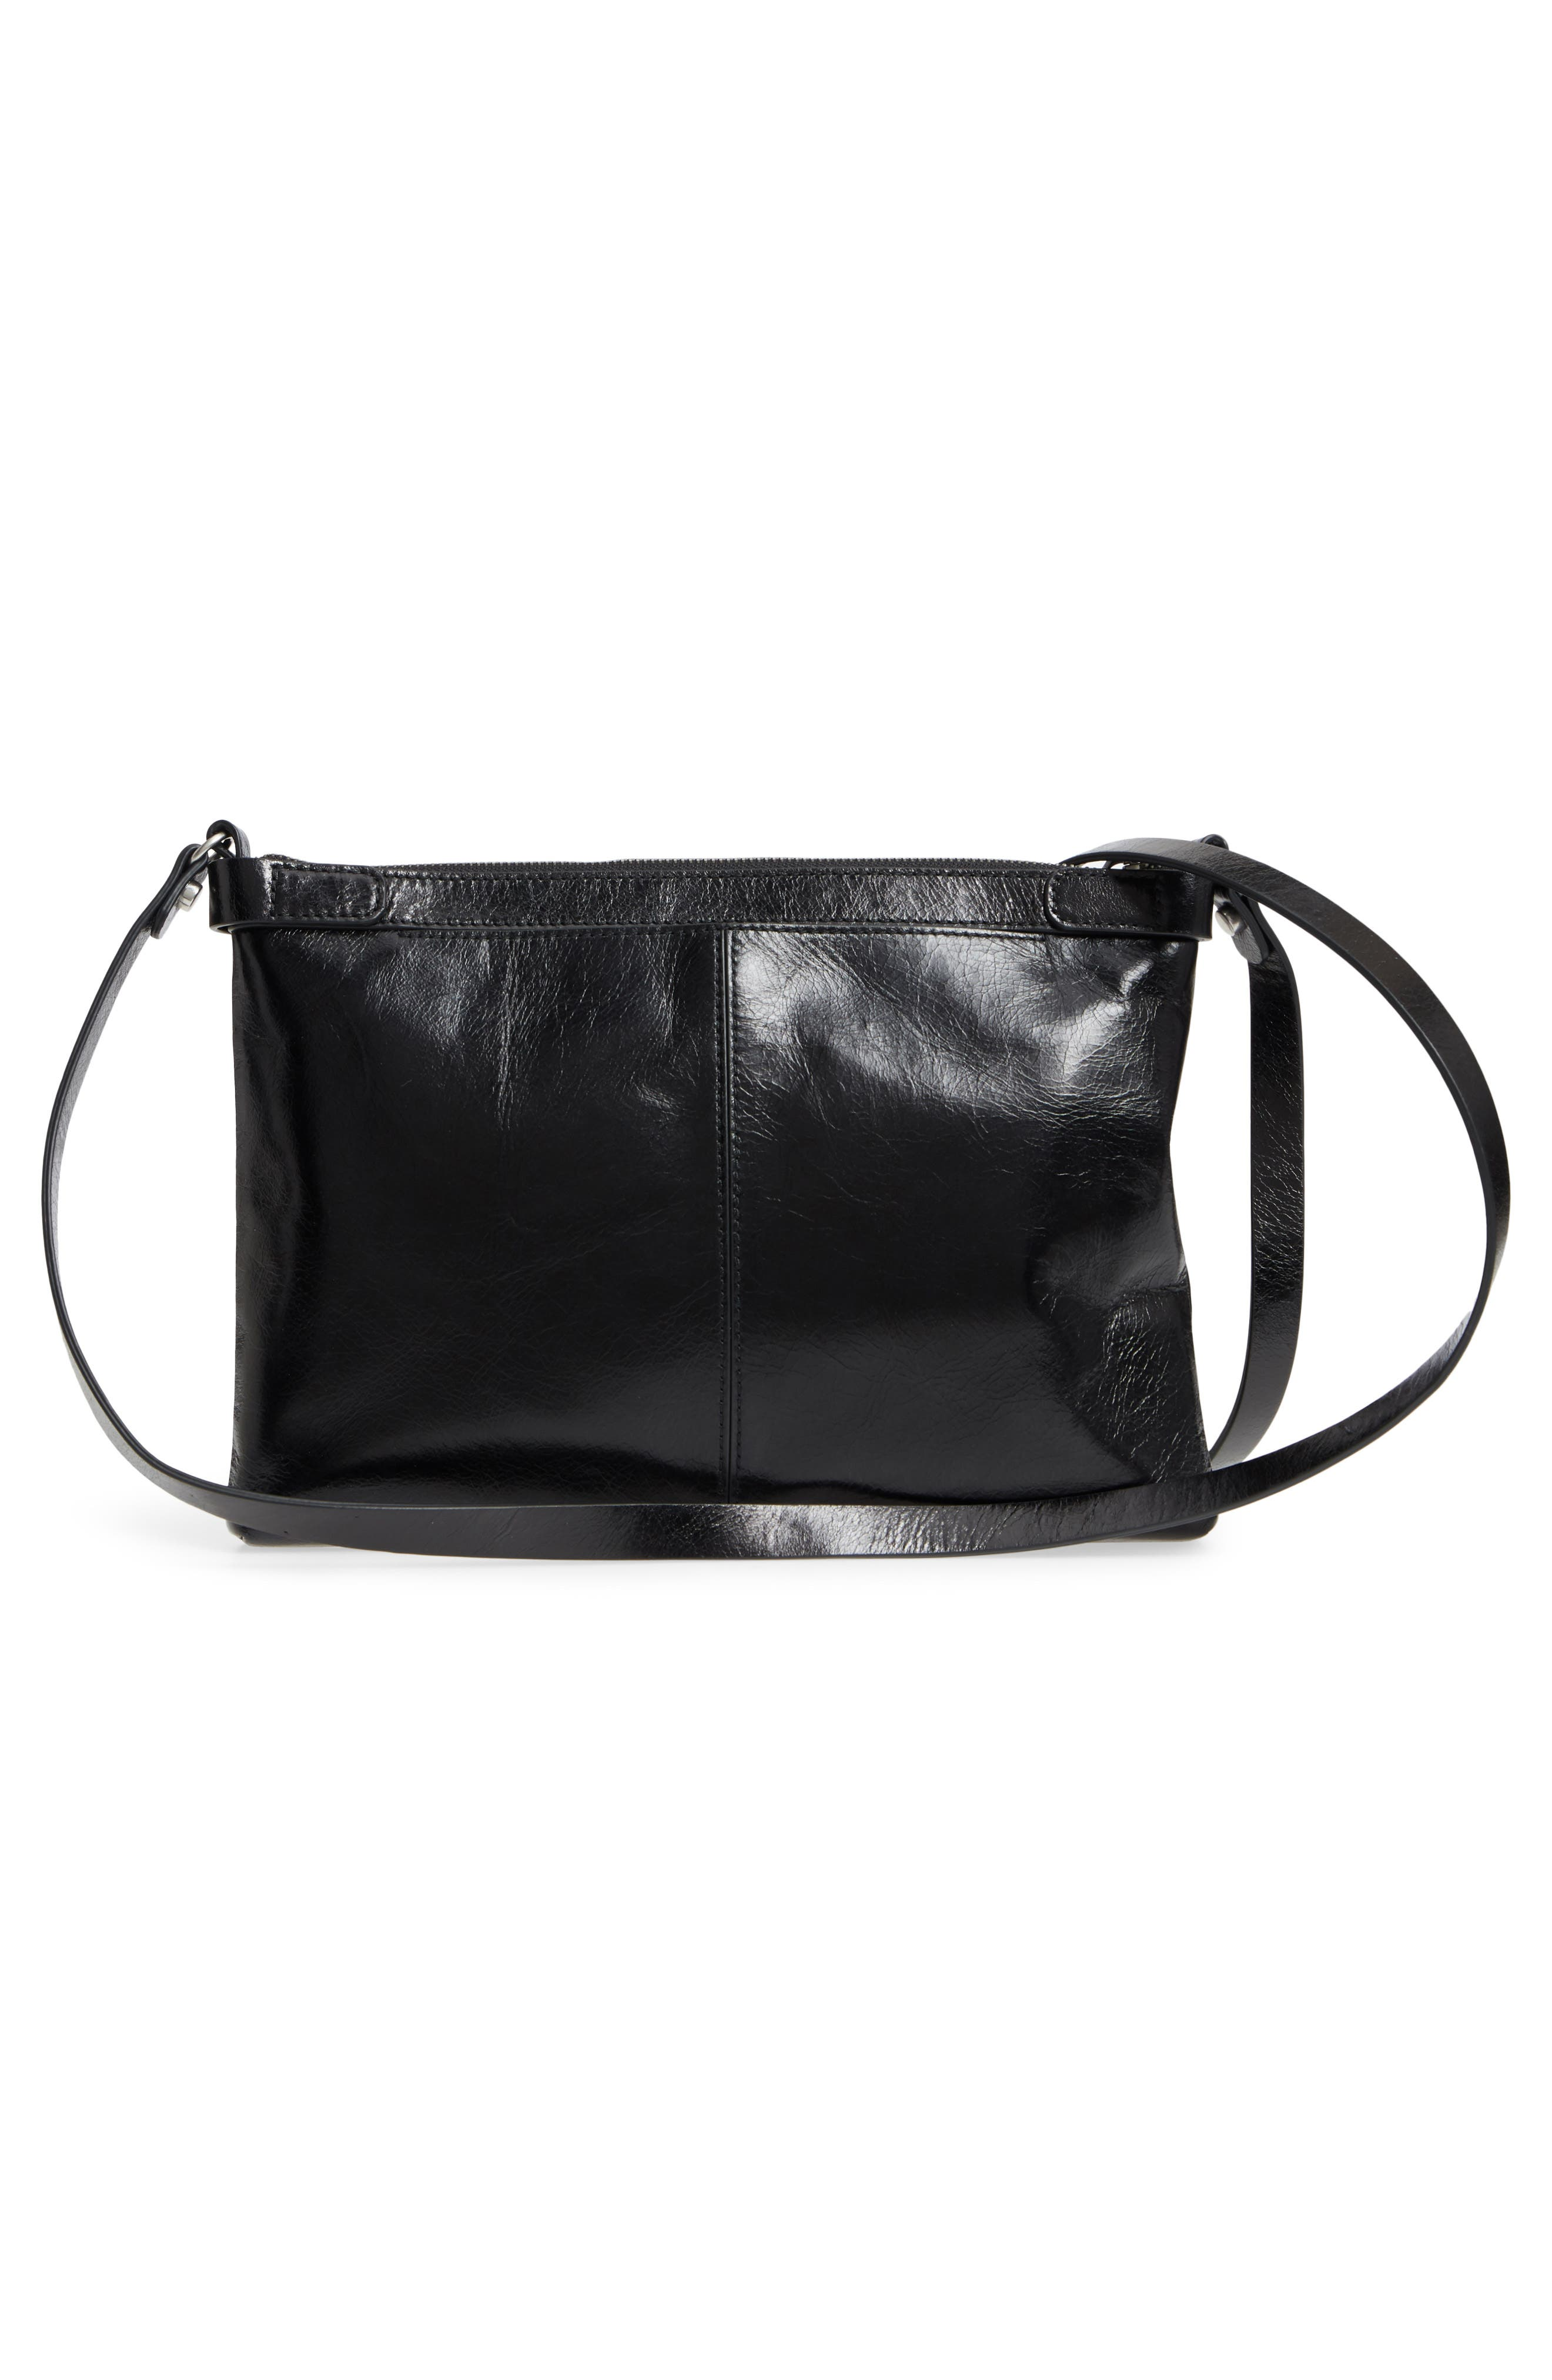 Marlow Glazed Leather Crossbody Bag,                             Alternate thumbnail 3, color,                             BLACK